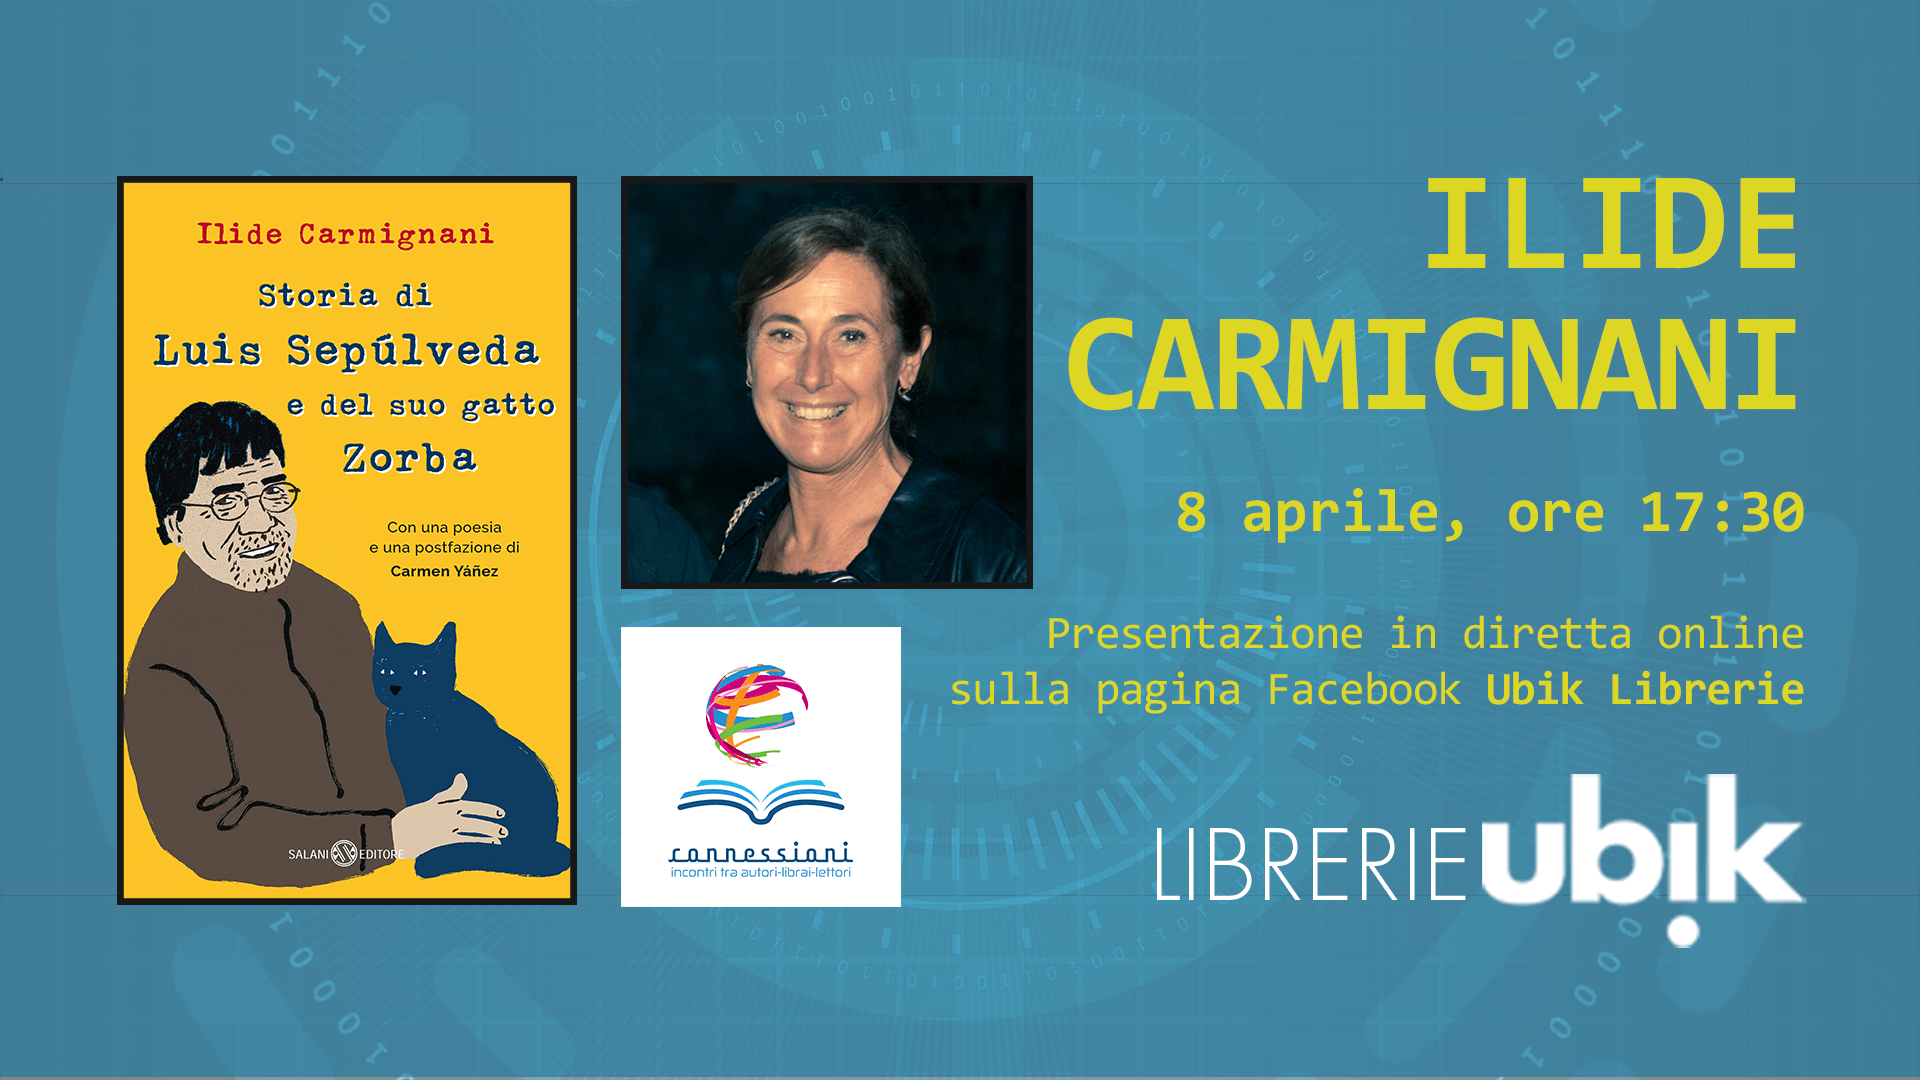 ILIDE CARMIGNANI presenta in diretta online